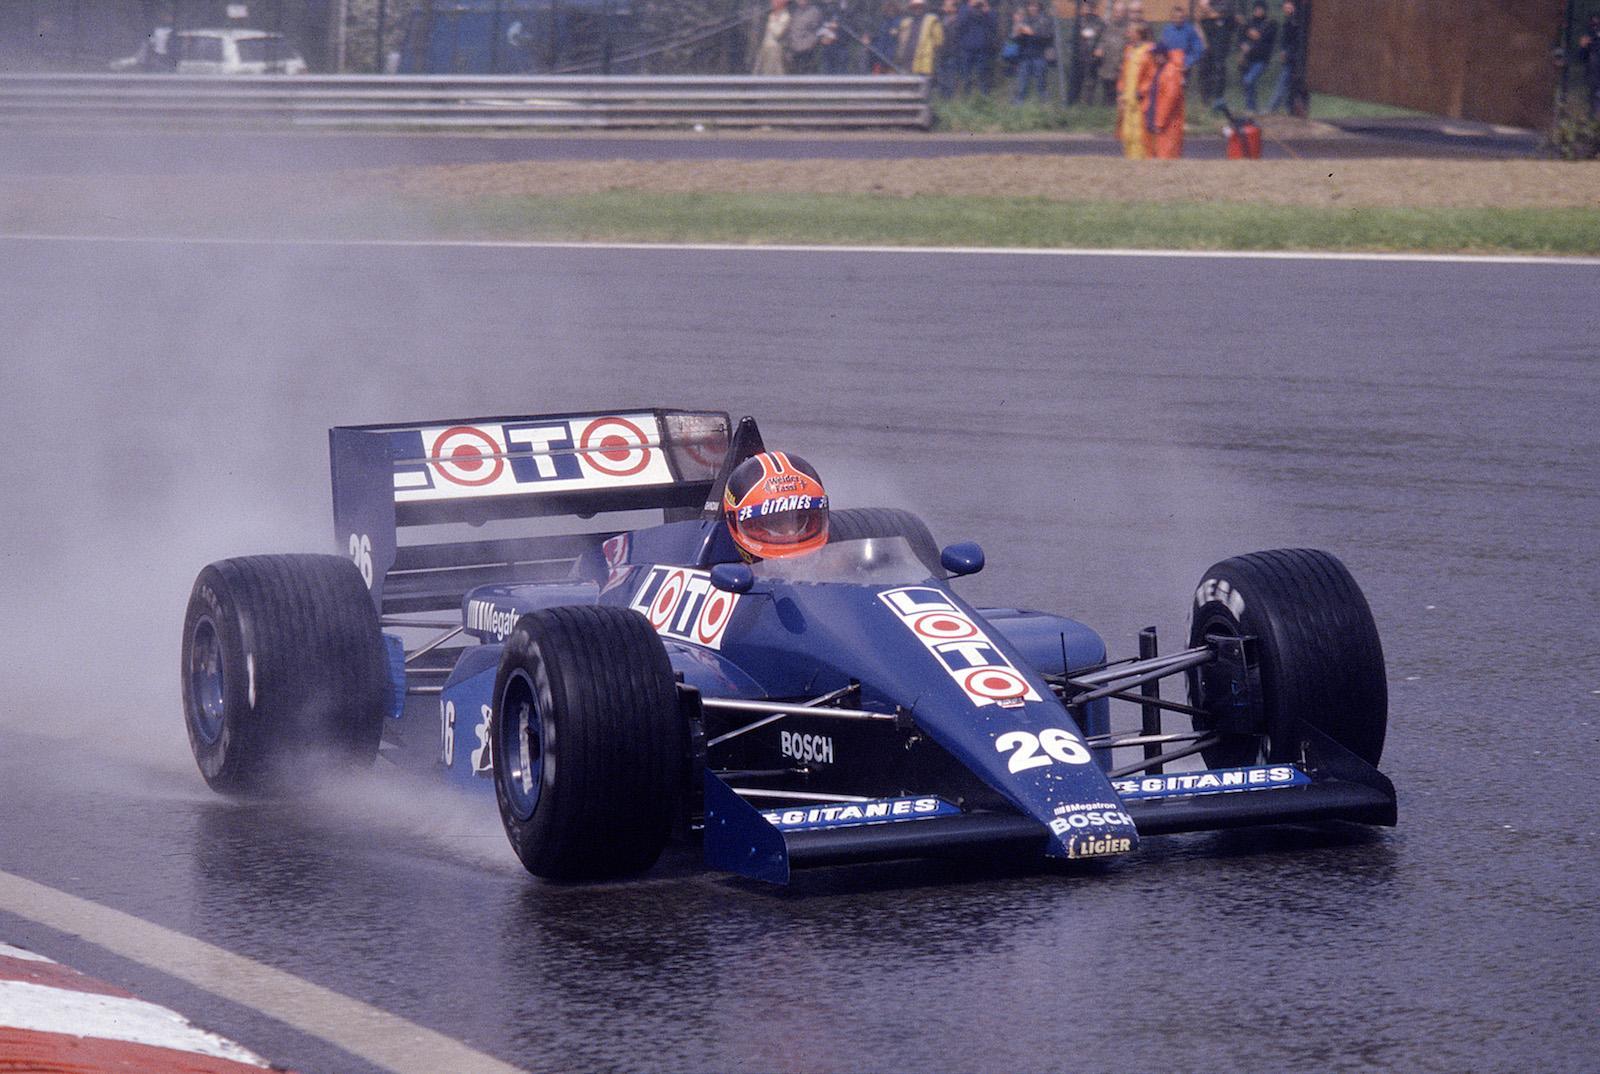 Piercarlo Ghinzani's Formula 1 struggles